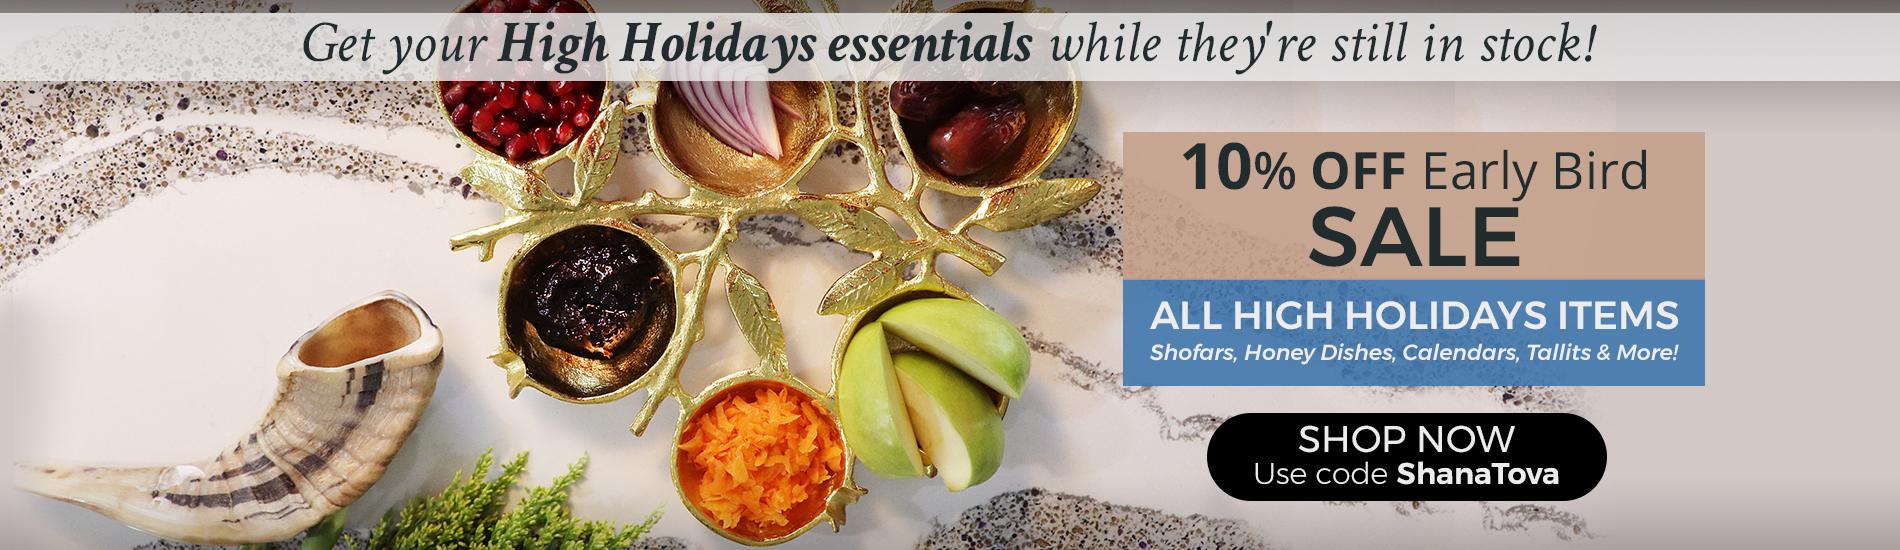 Shop for Rosh Hashanah at Judaica.com!